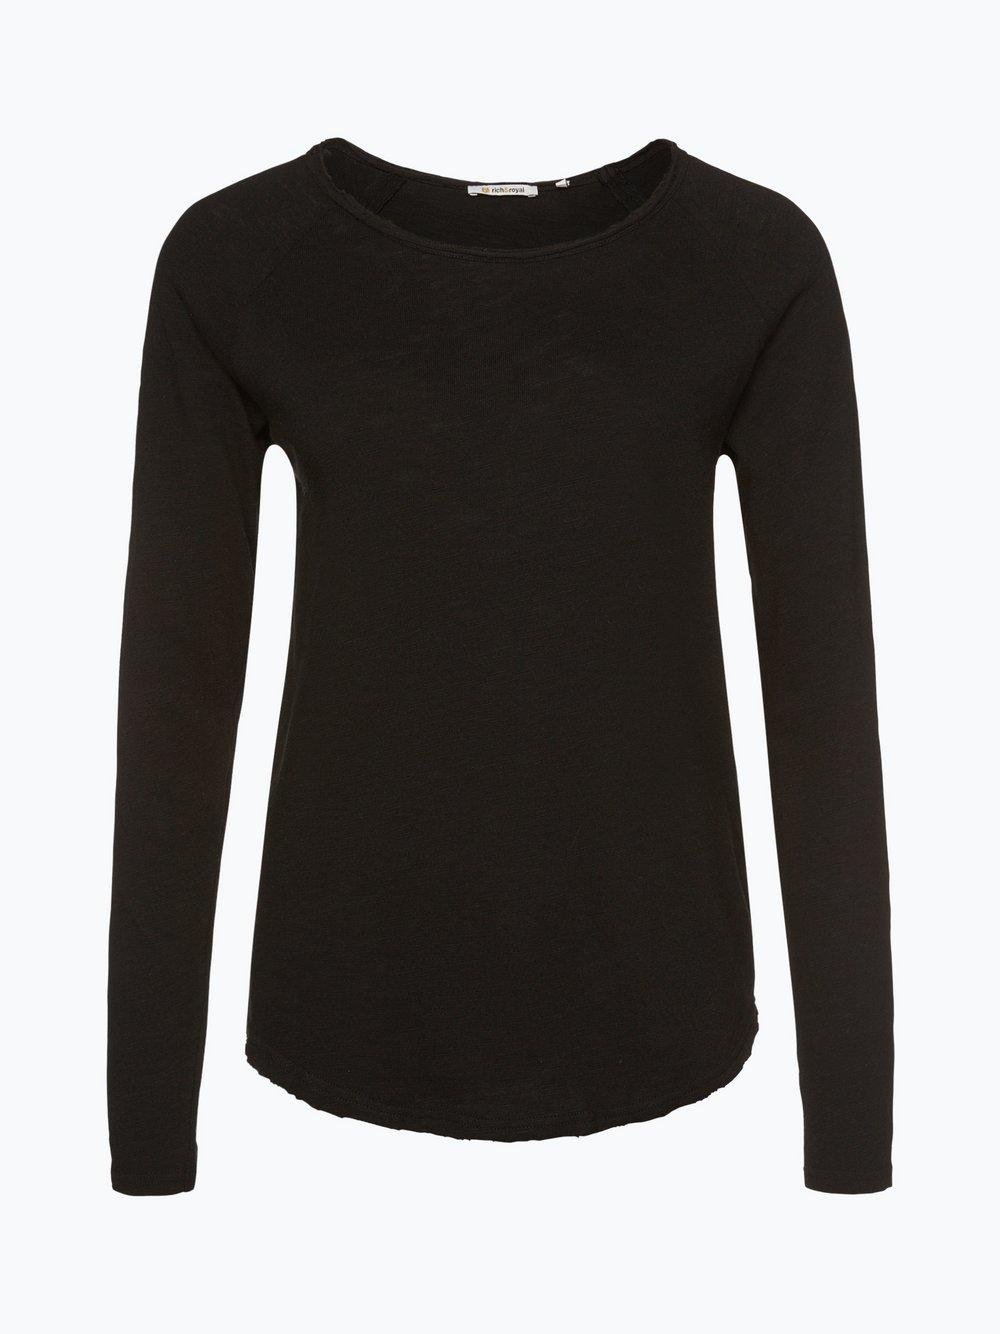 Rich & Royal - Damska koszulka z długim rękawem, czarny